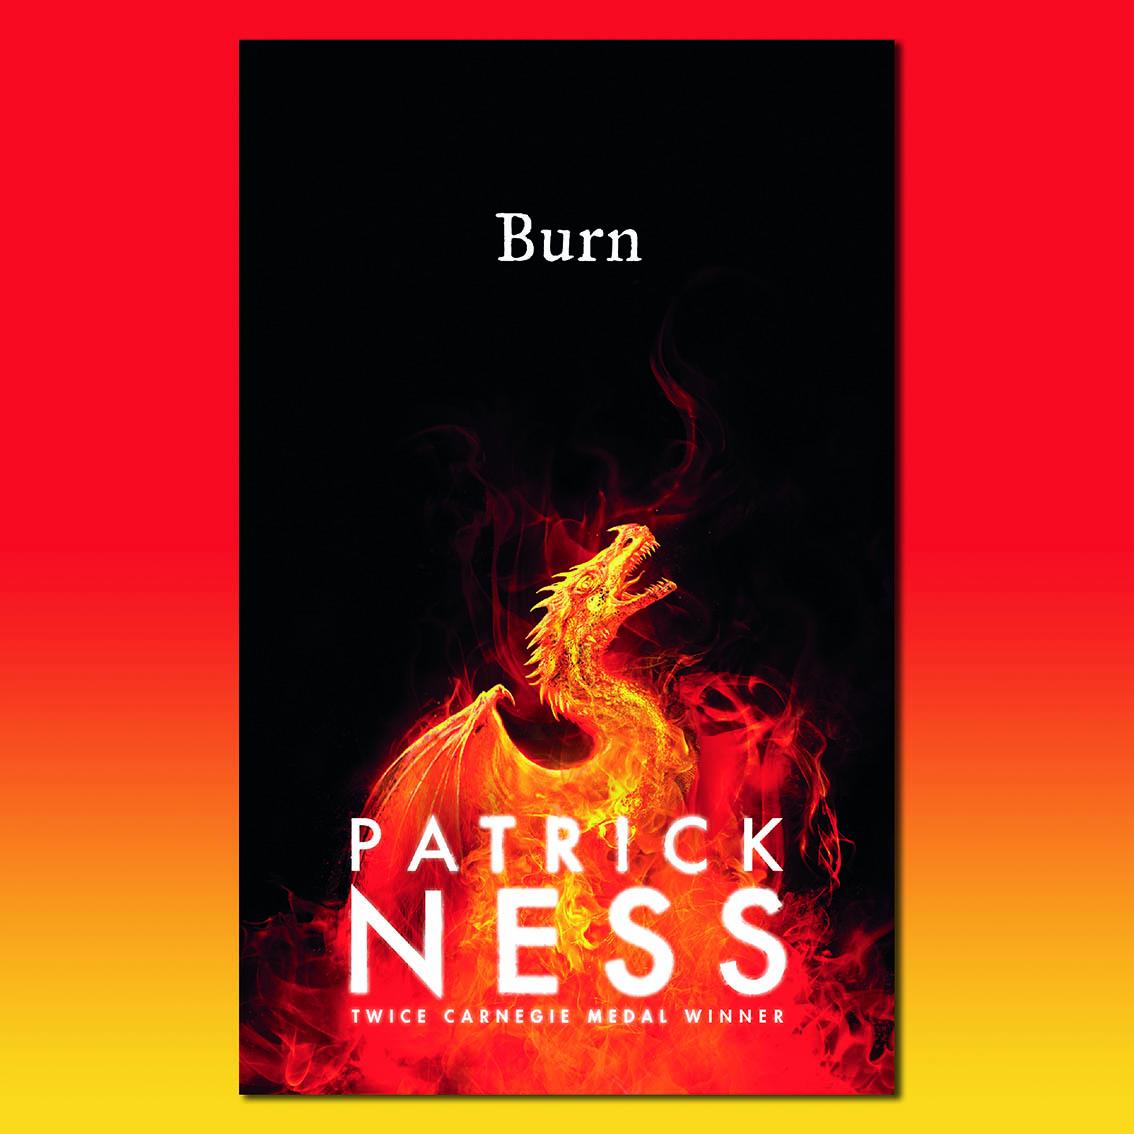 Burn by Patrick